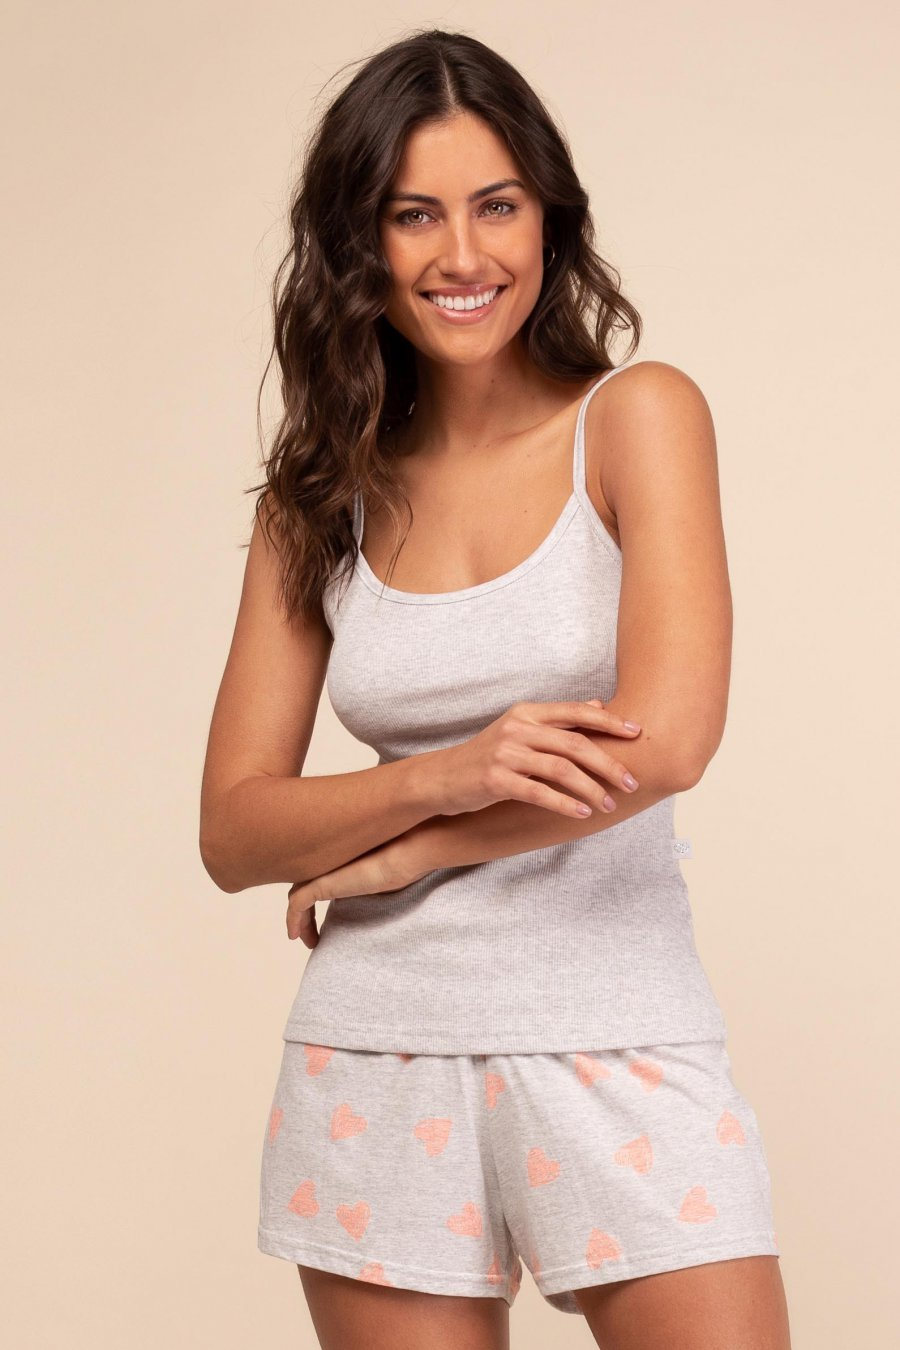 Pijama At Home Happy Moments Verão 2021